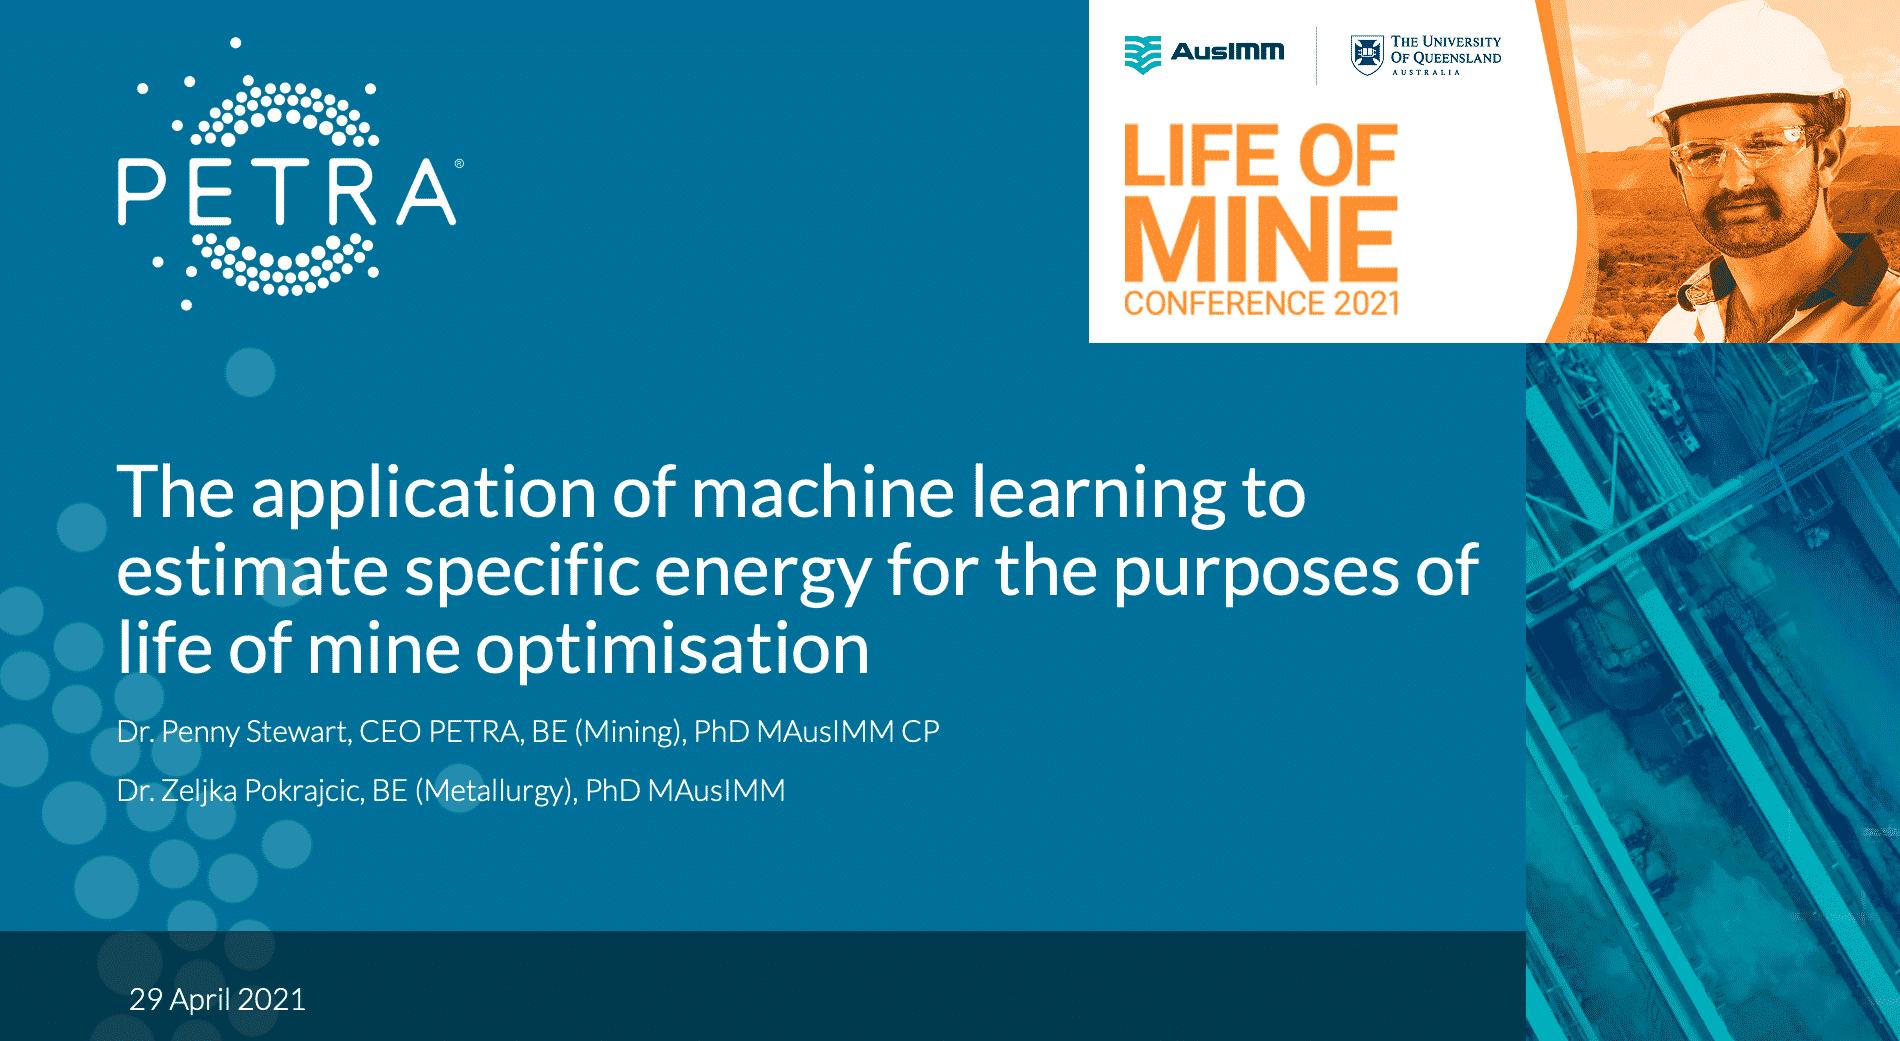 PETRA at AusIMM Presentation Slide Image